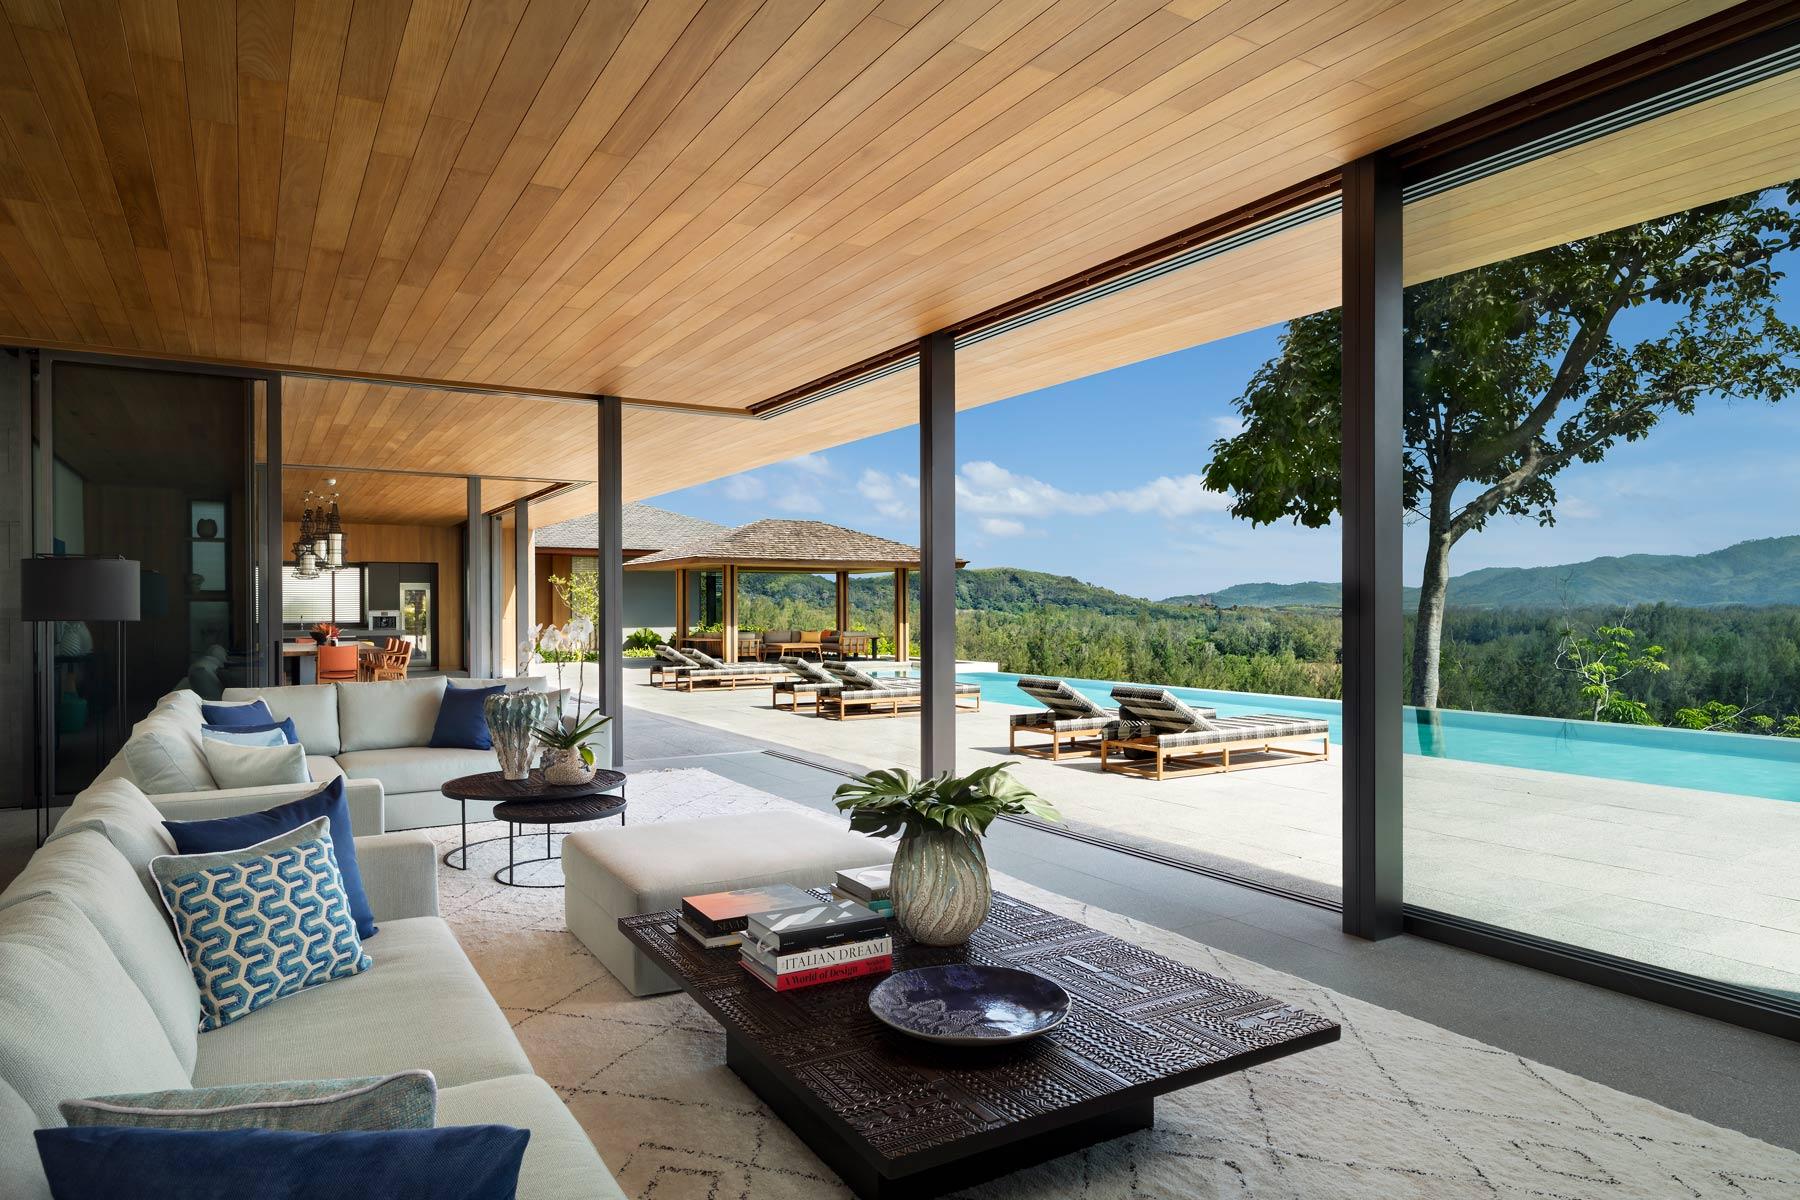 Avadina Hills Project Development Interior Design Service in Phuket & Samui